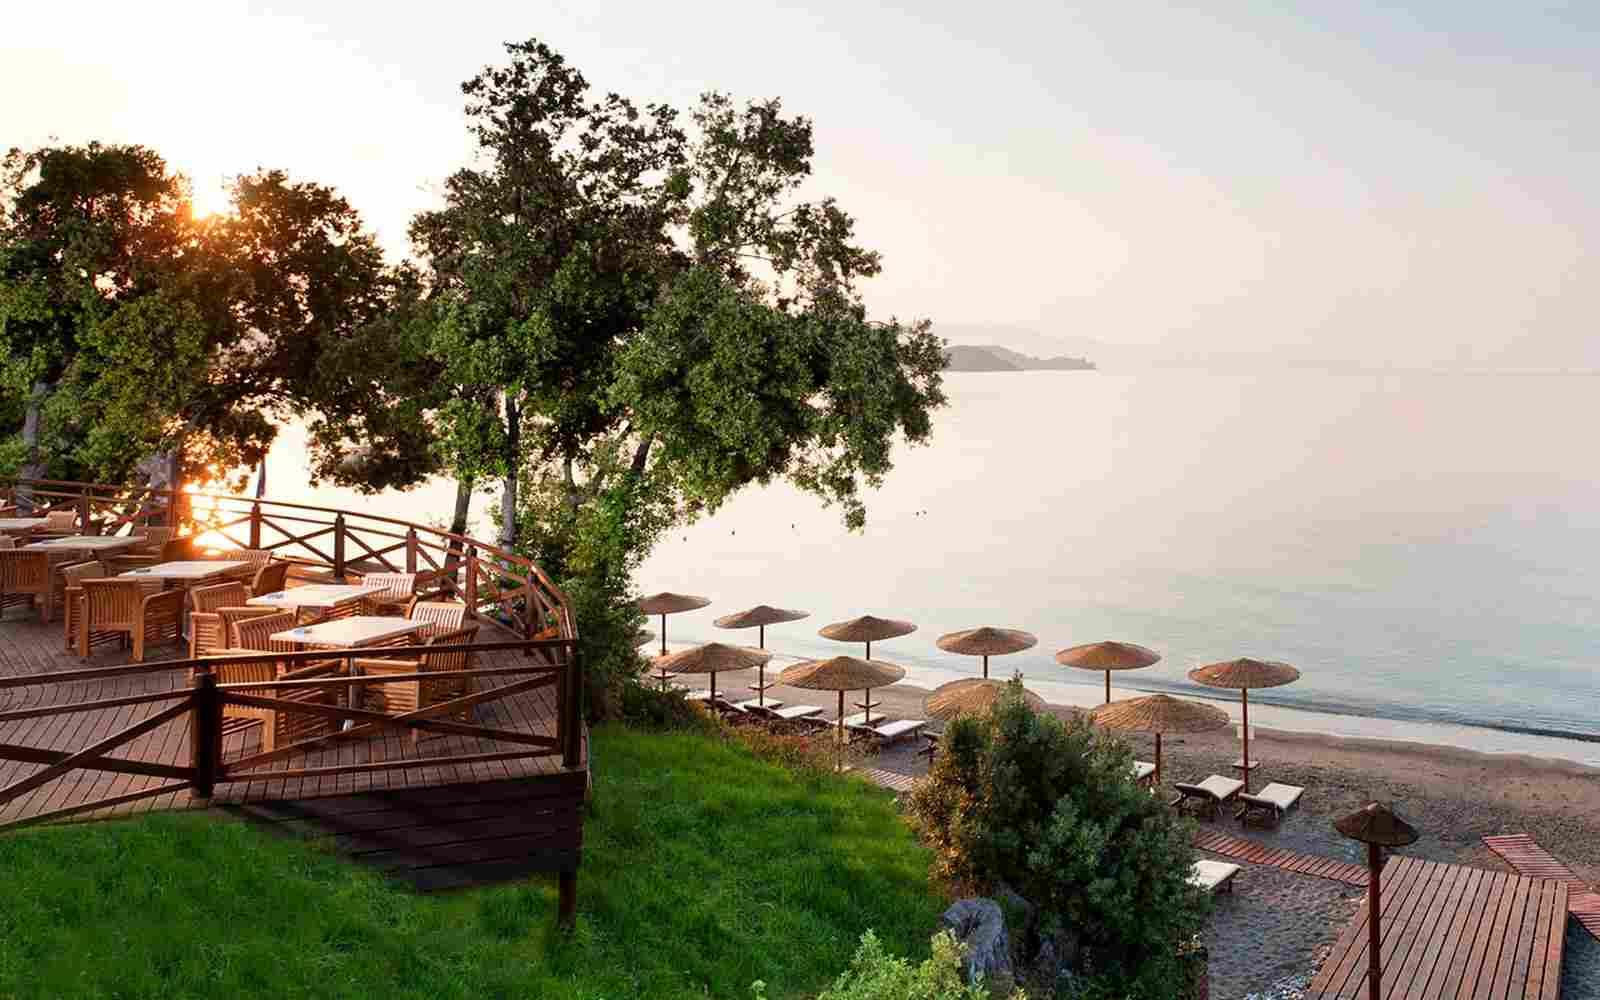 https://www.okohotel.co.nz/wp-content/uploads/2016/03/summer-beach-03.jpg